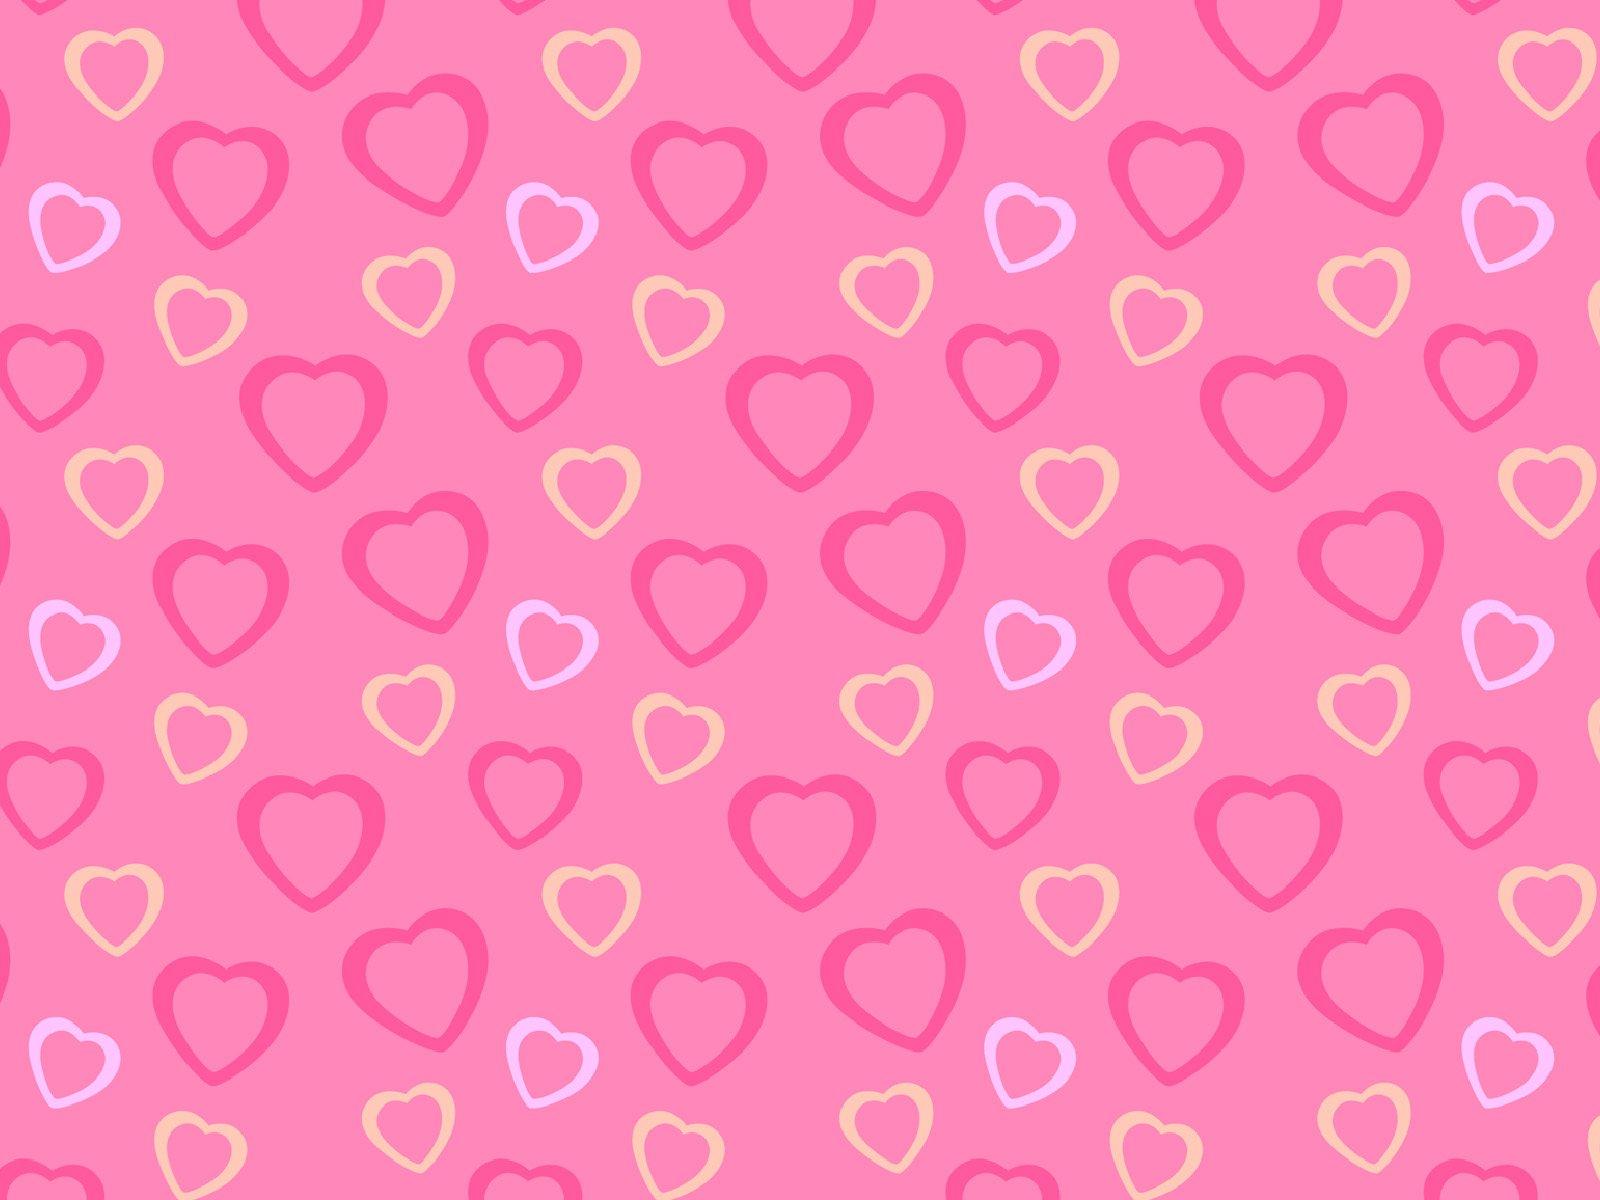 Love hearts background wallpapersafari - Love wallpaper background ...